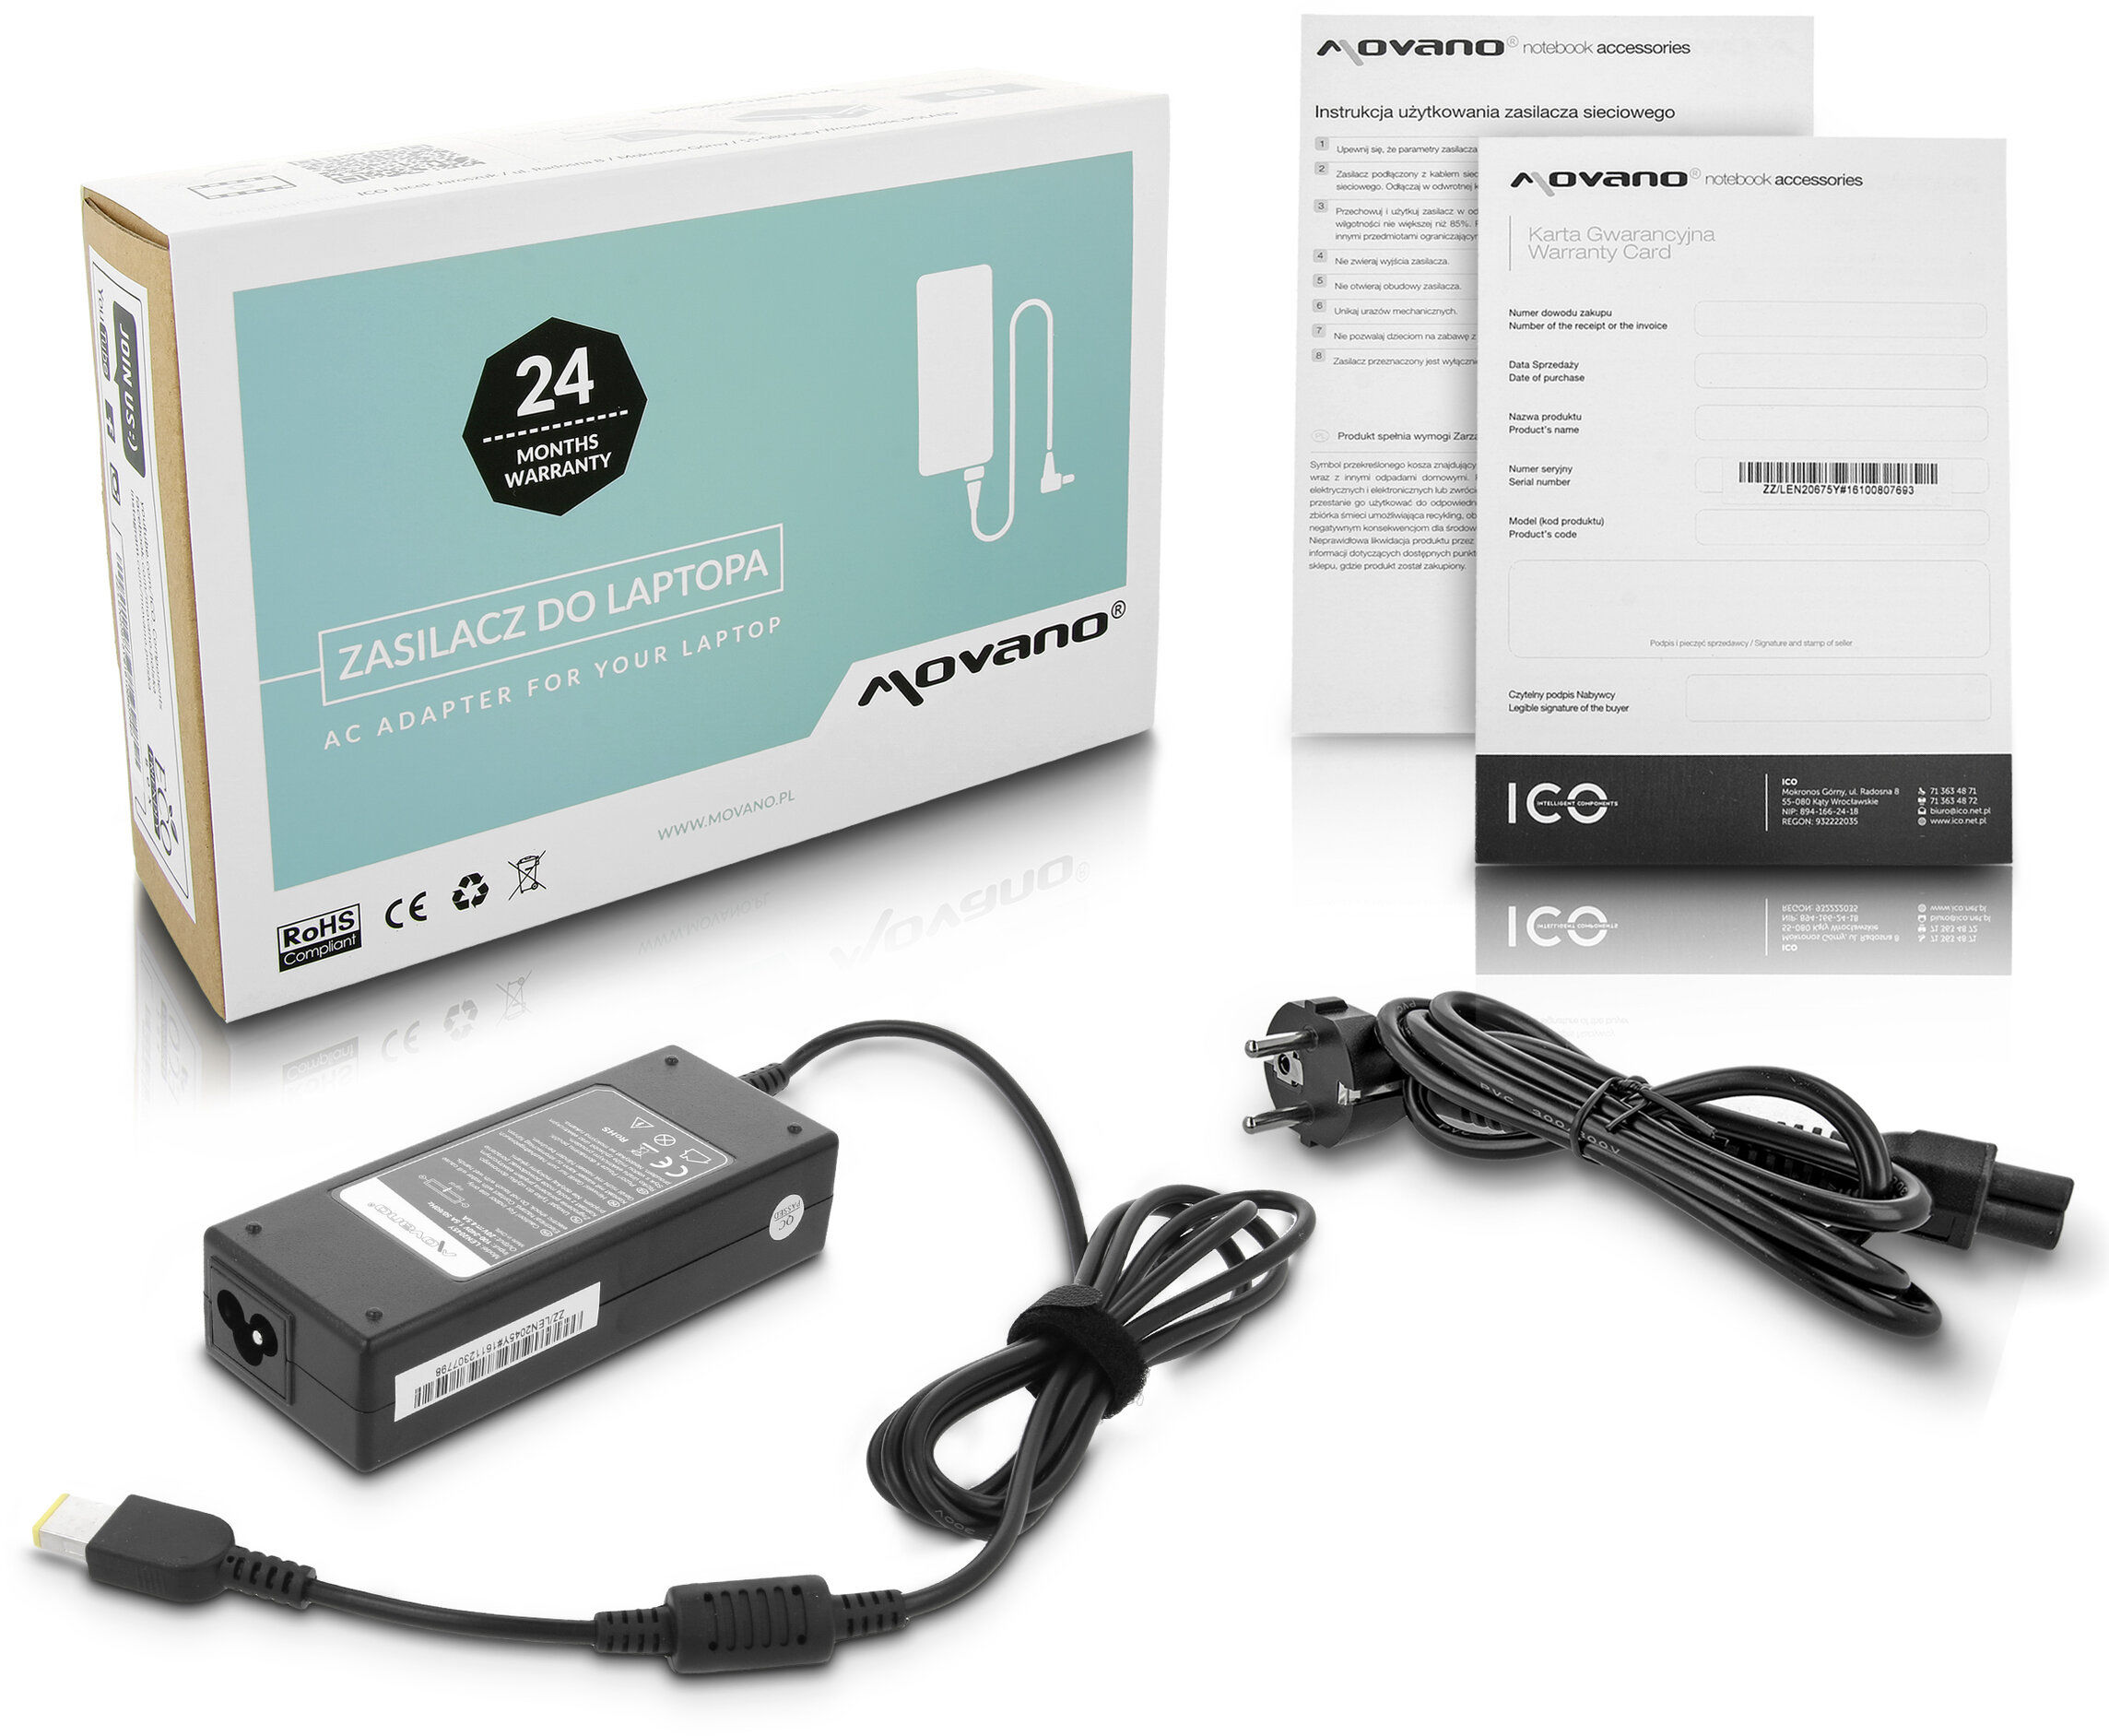 Zasilacz Lenovo 0B46994 45N0235 Thinkpad S5 X1 Movano 20V 4.5A - yoga